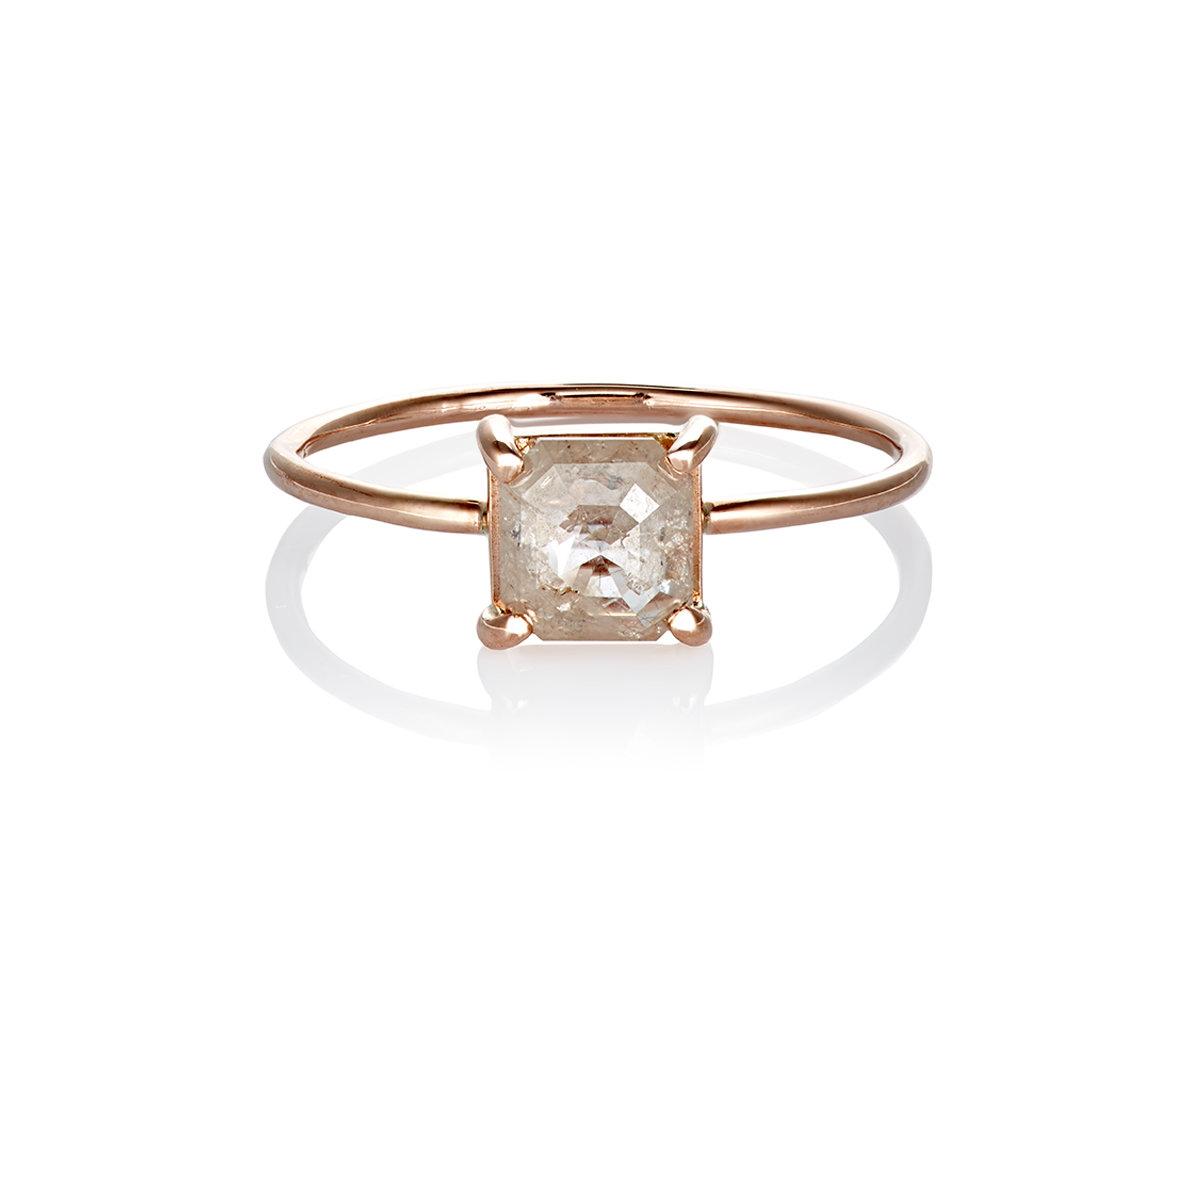 Grace Lee Designs 14-karat Gold, Pearl And Diamond Ring